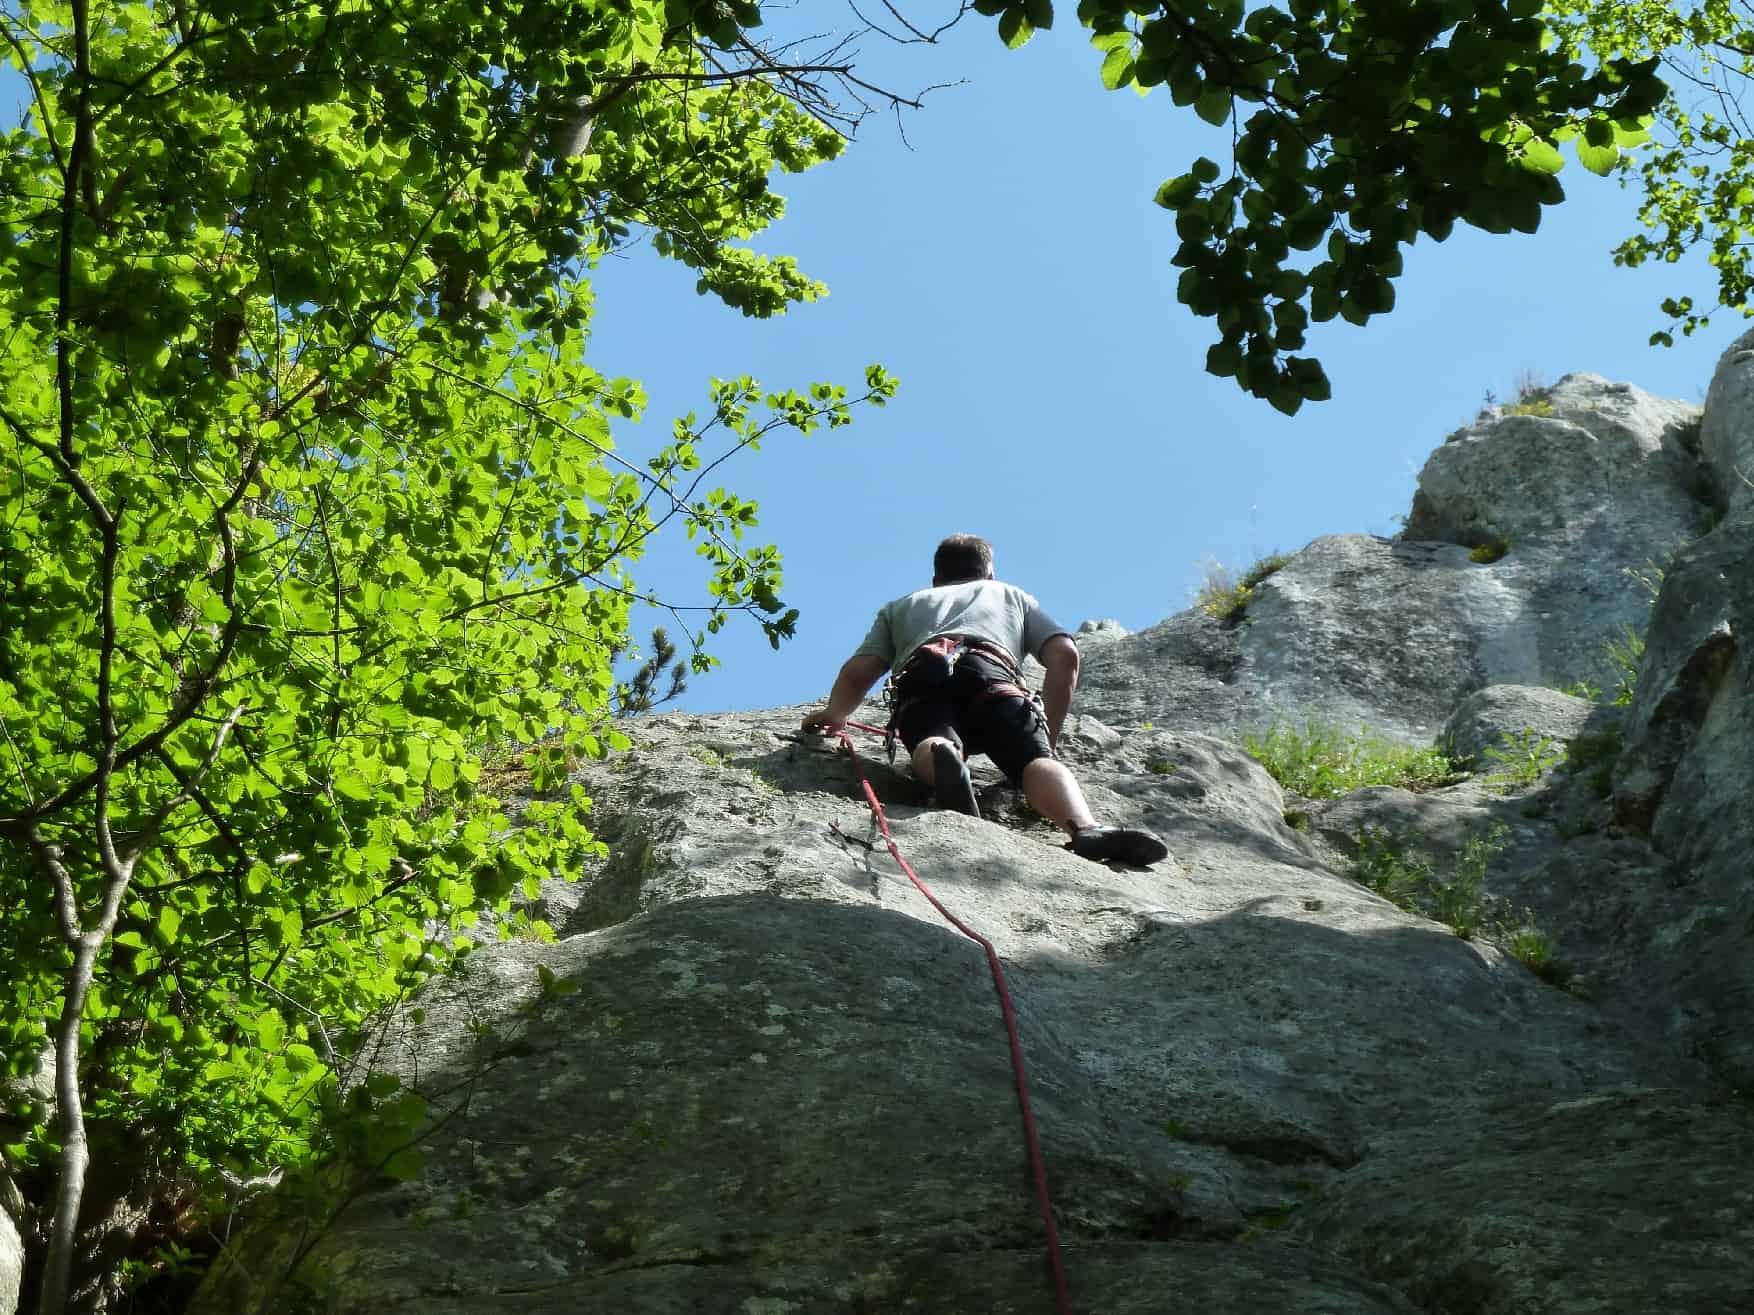 Klettern bei Prunn